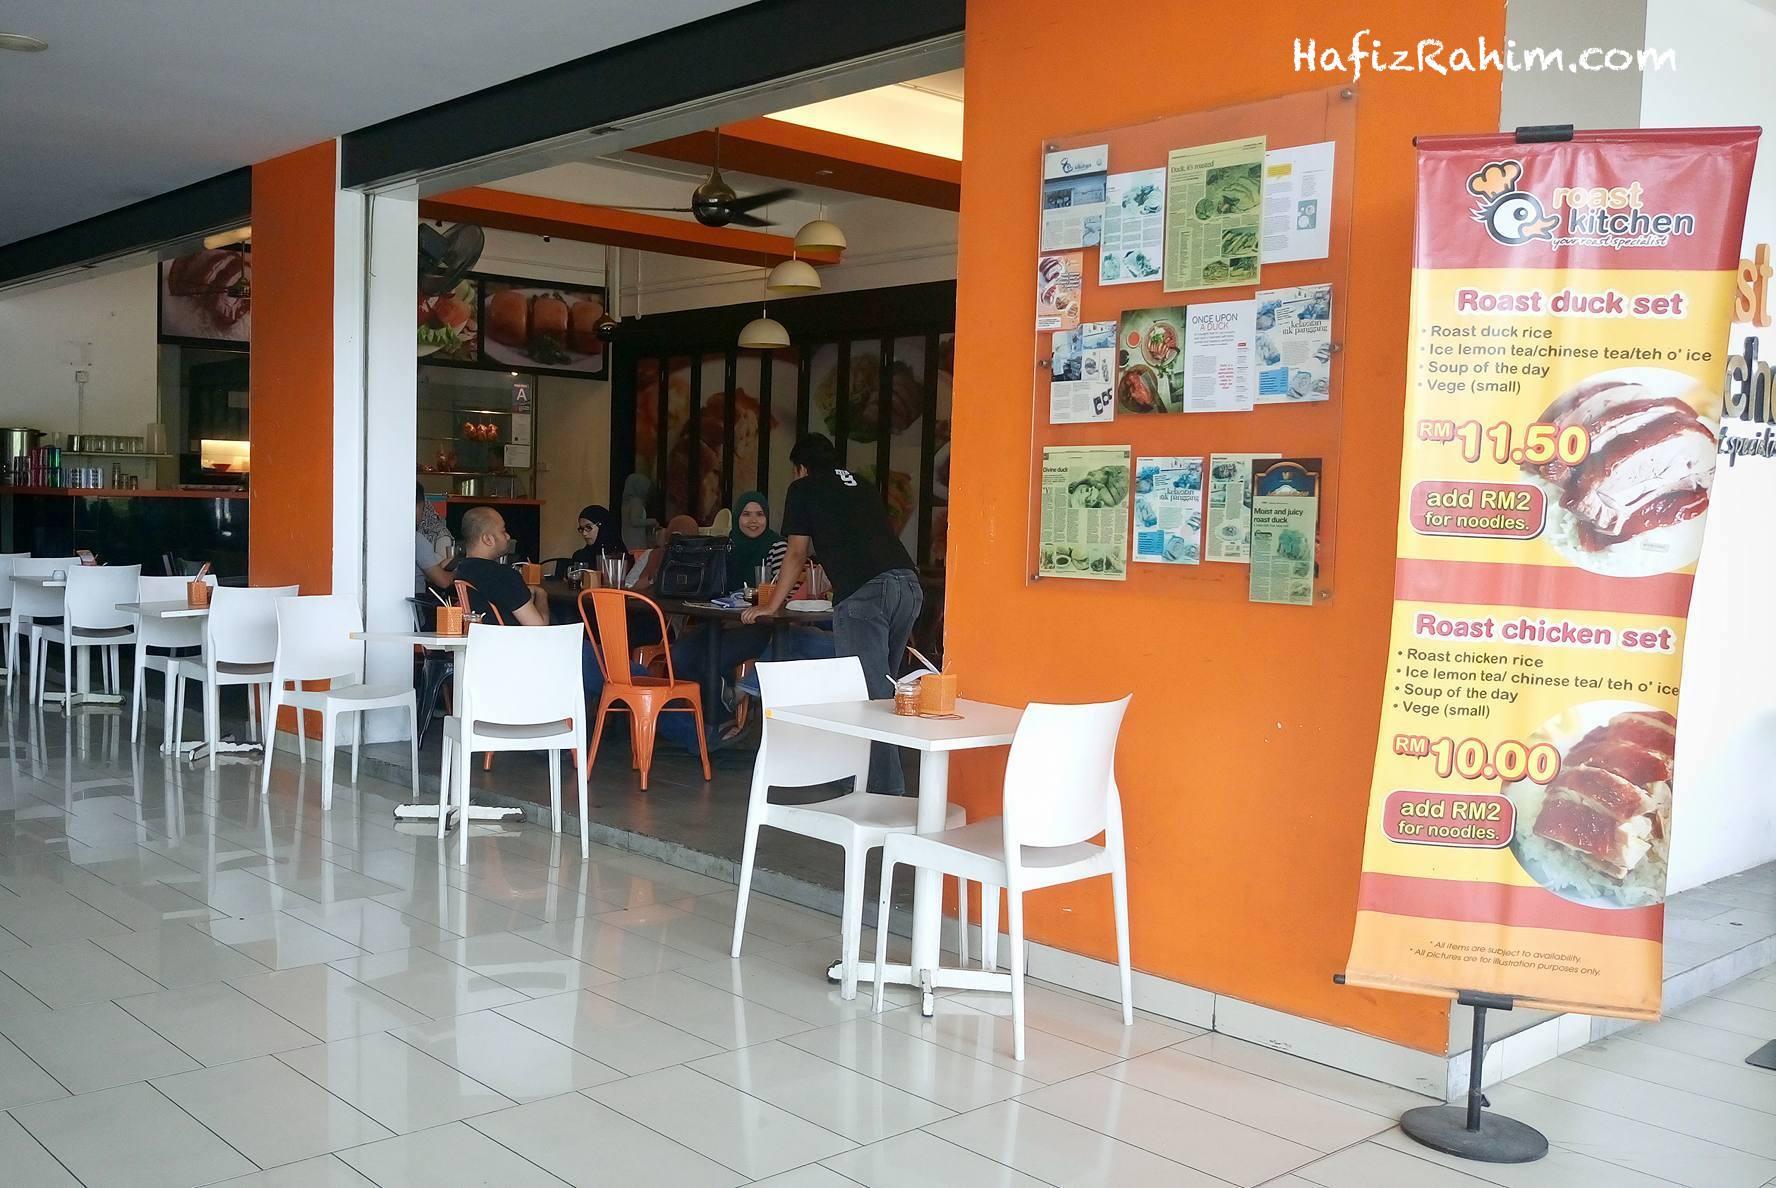 Menikmati itik panggang halal di cyberjaya hafiz rahim for Kitchen set restoran